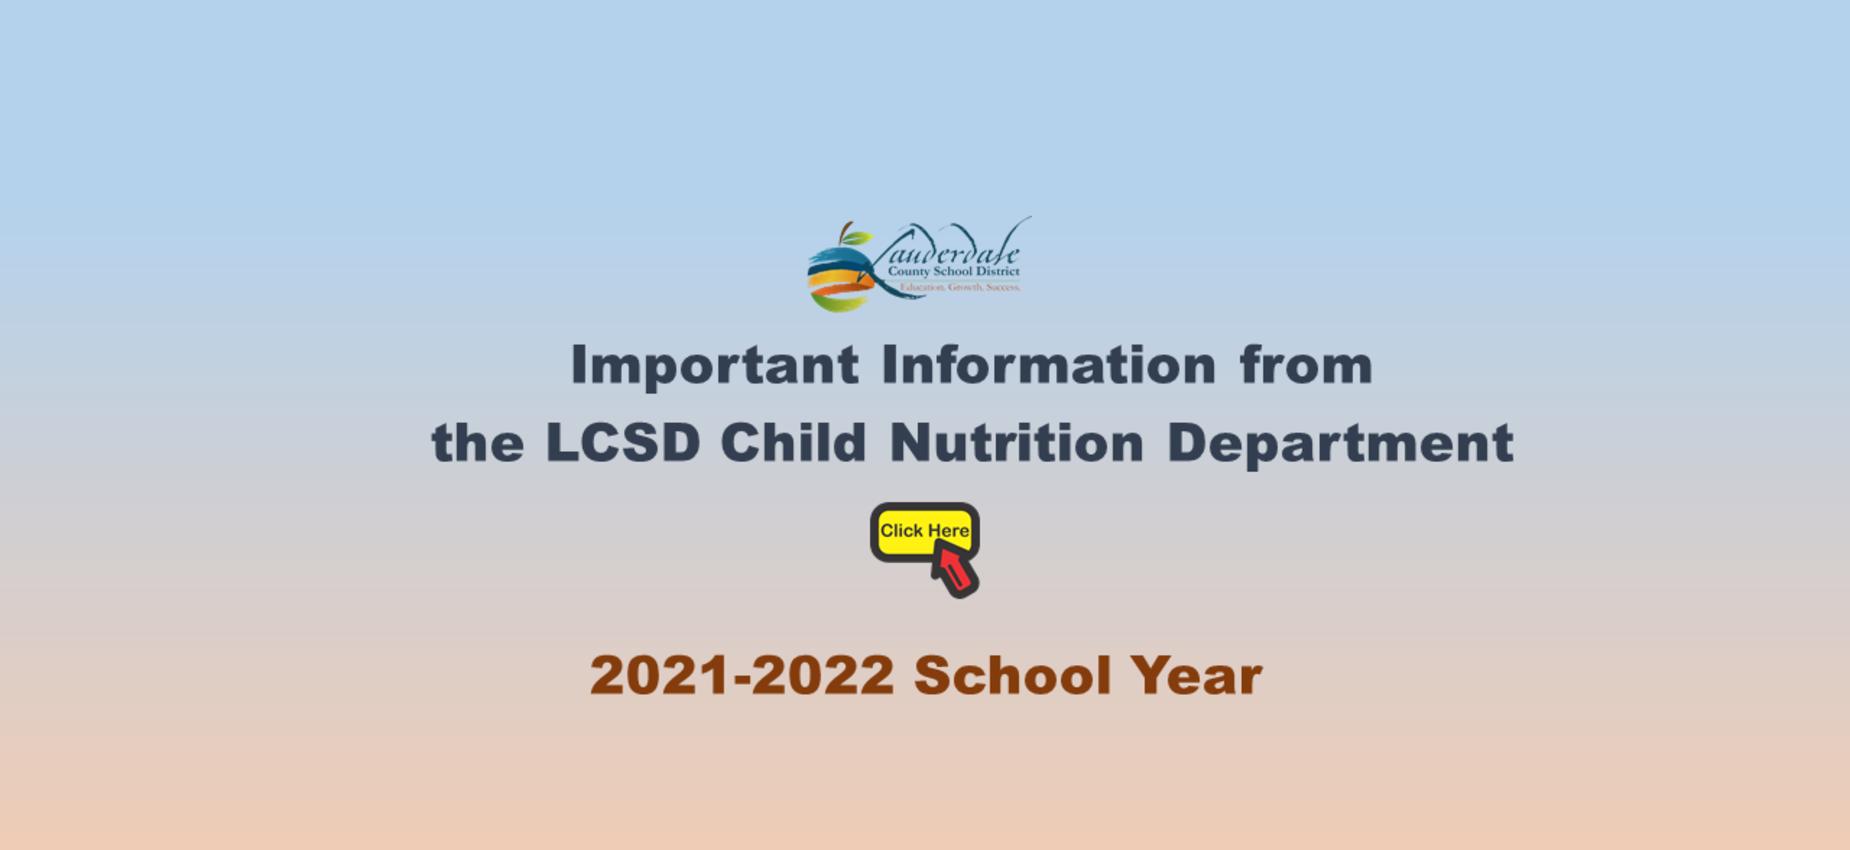 Child Nutrition Information Graphic